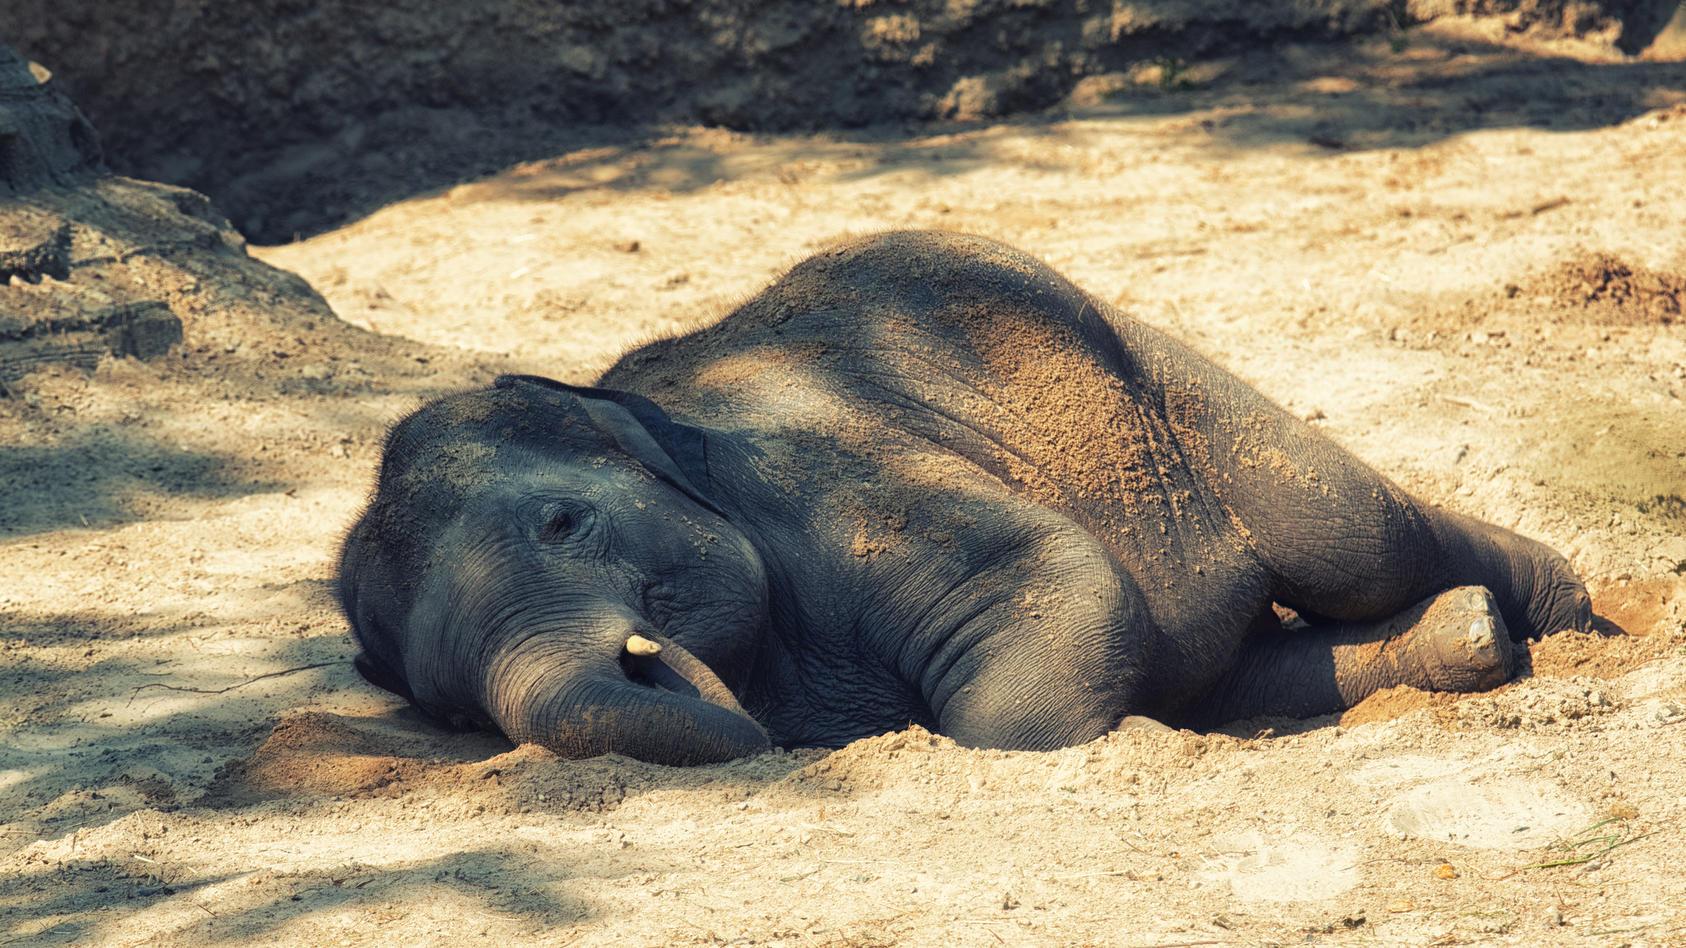 Warum sterben in Botsuana so viele Elefanten?